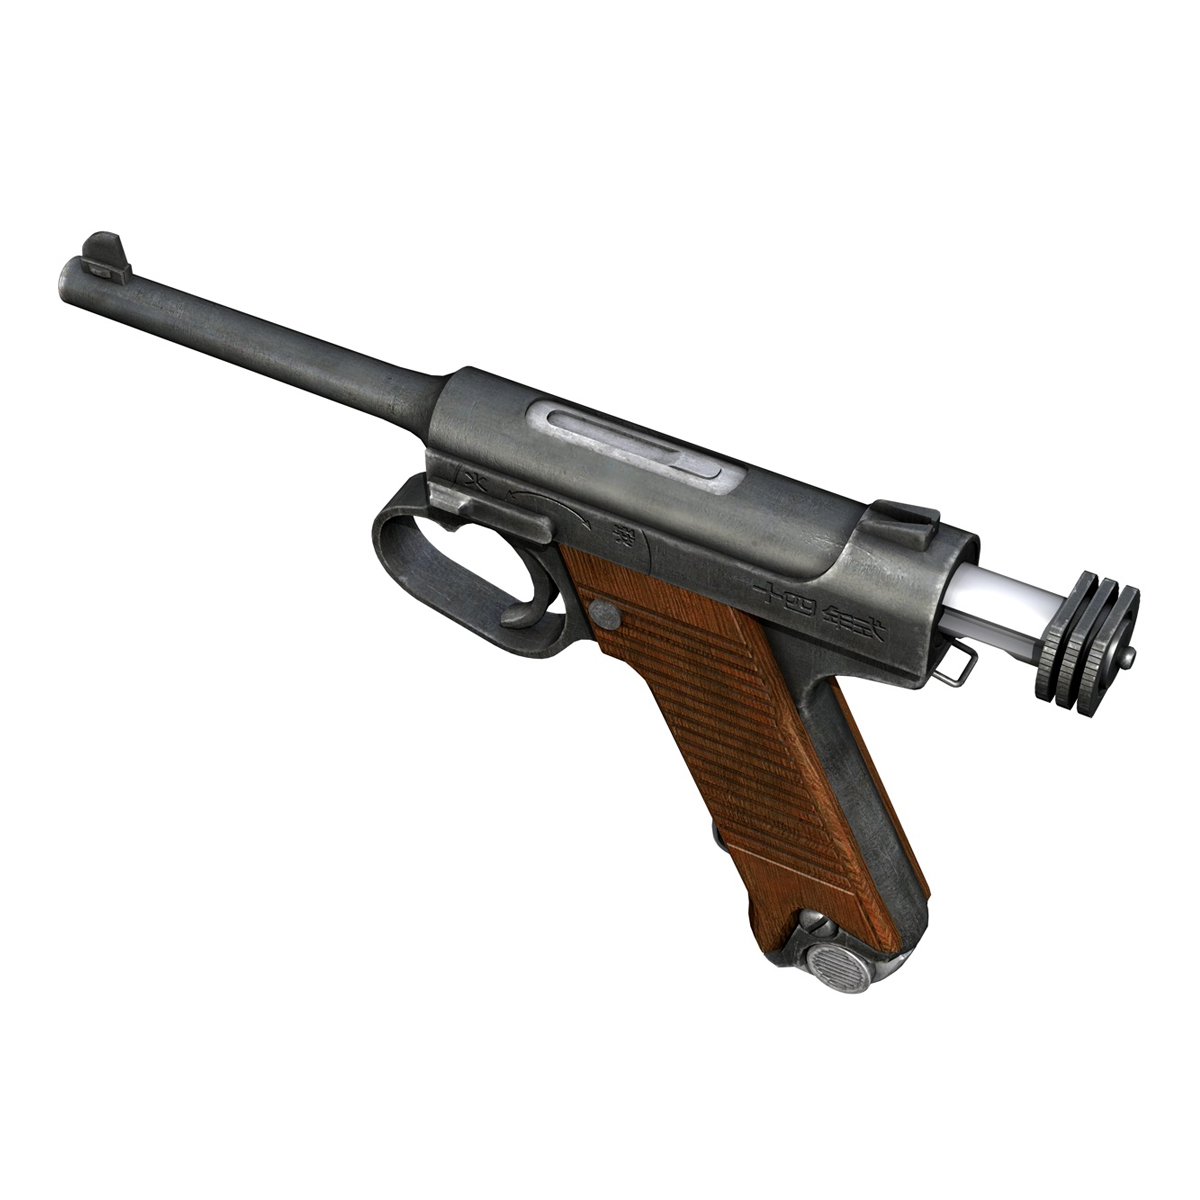 Nambu pištolj tip 14 3d model 3ds fbx c4d lwo obj 195157